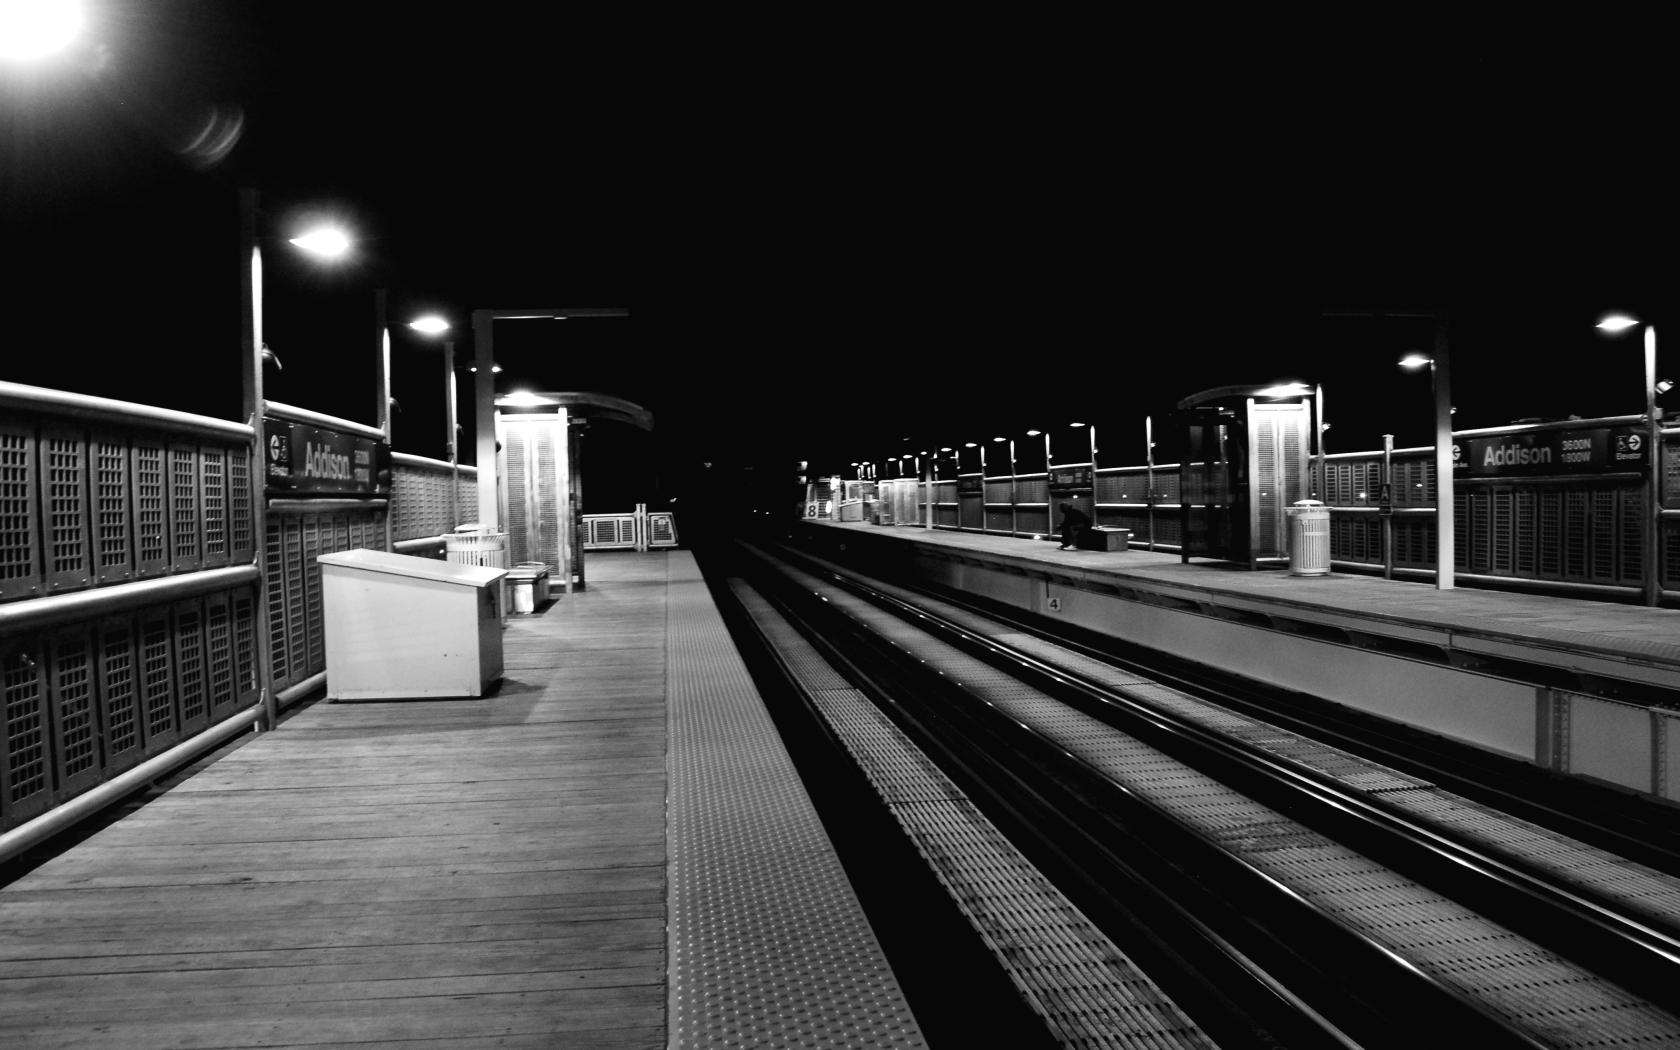 night subway station autostraddle